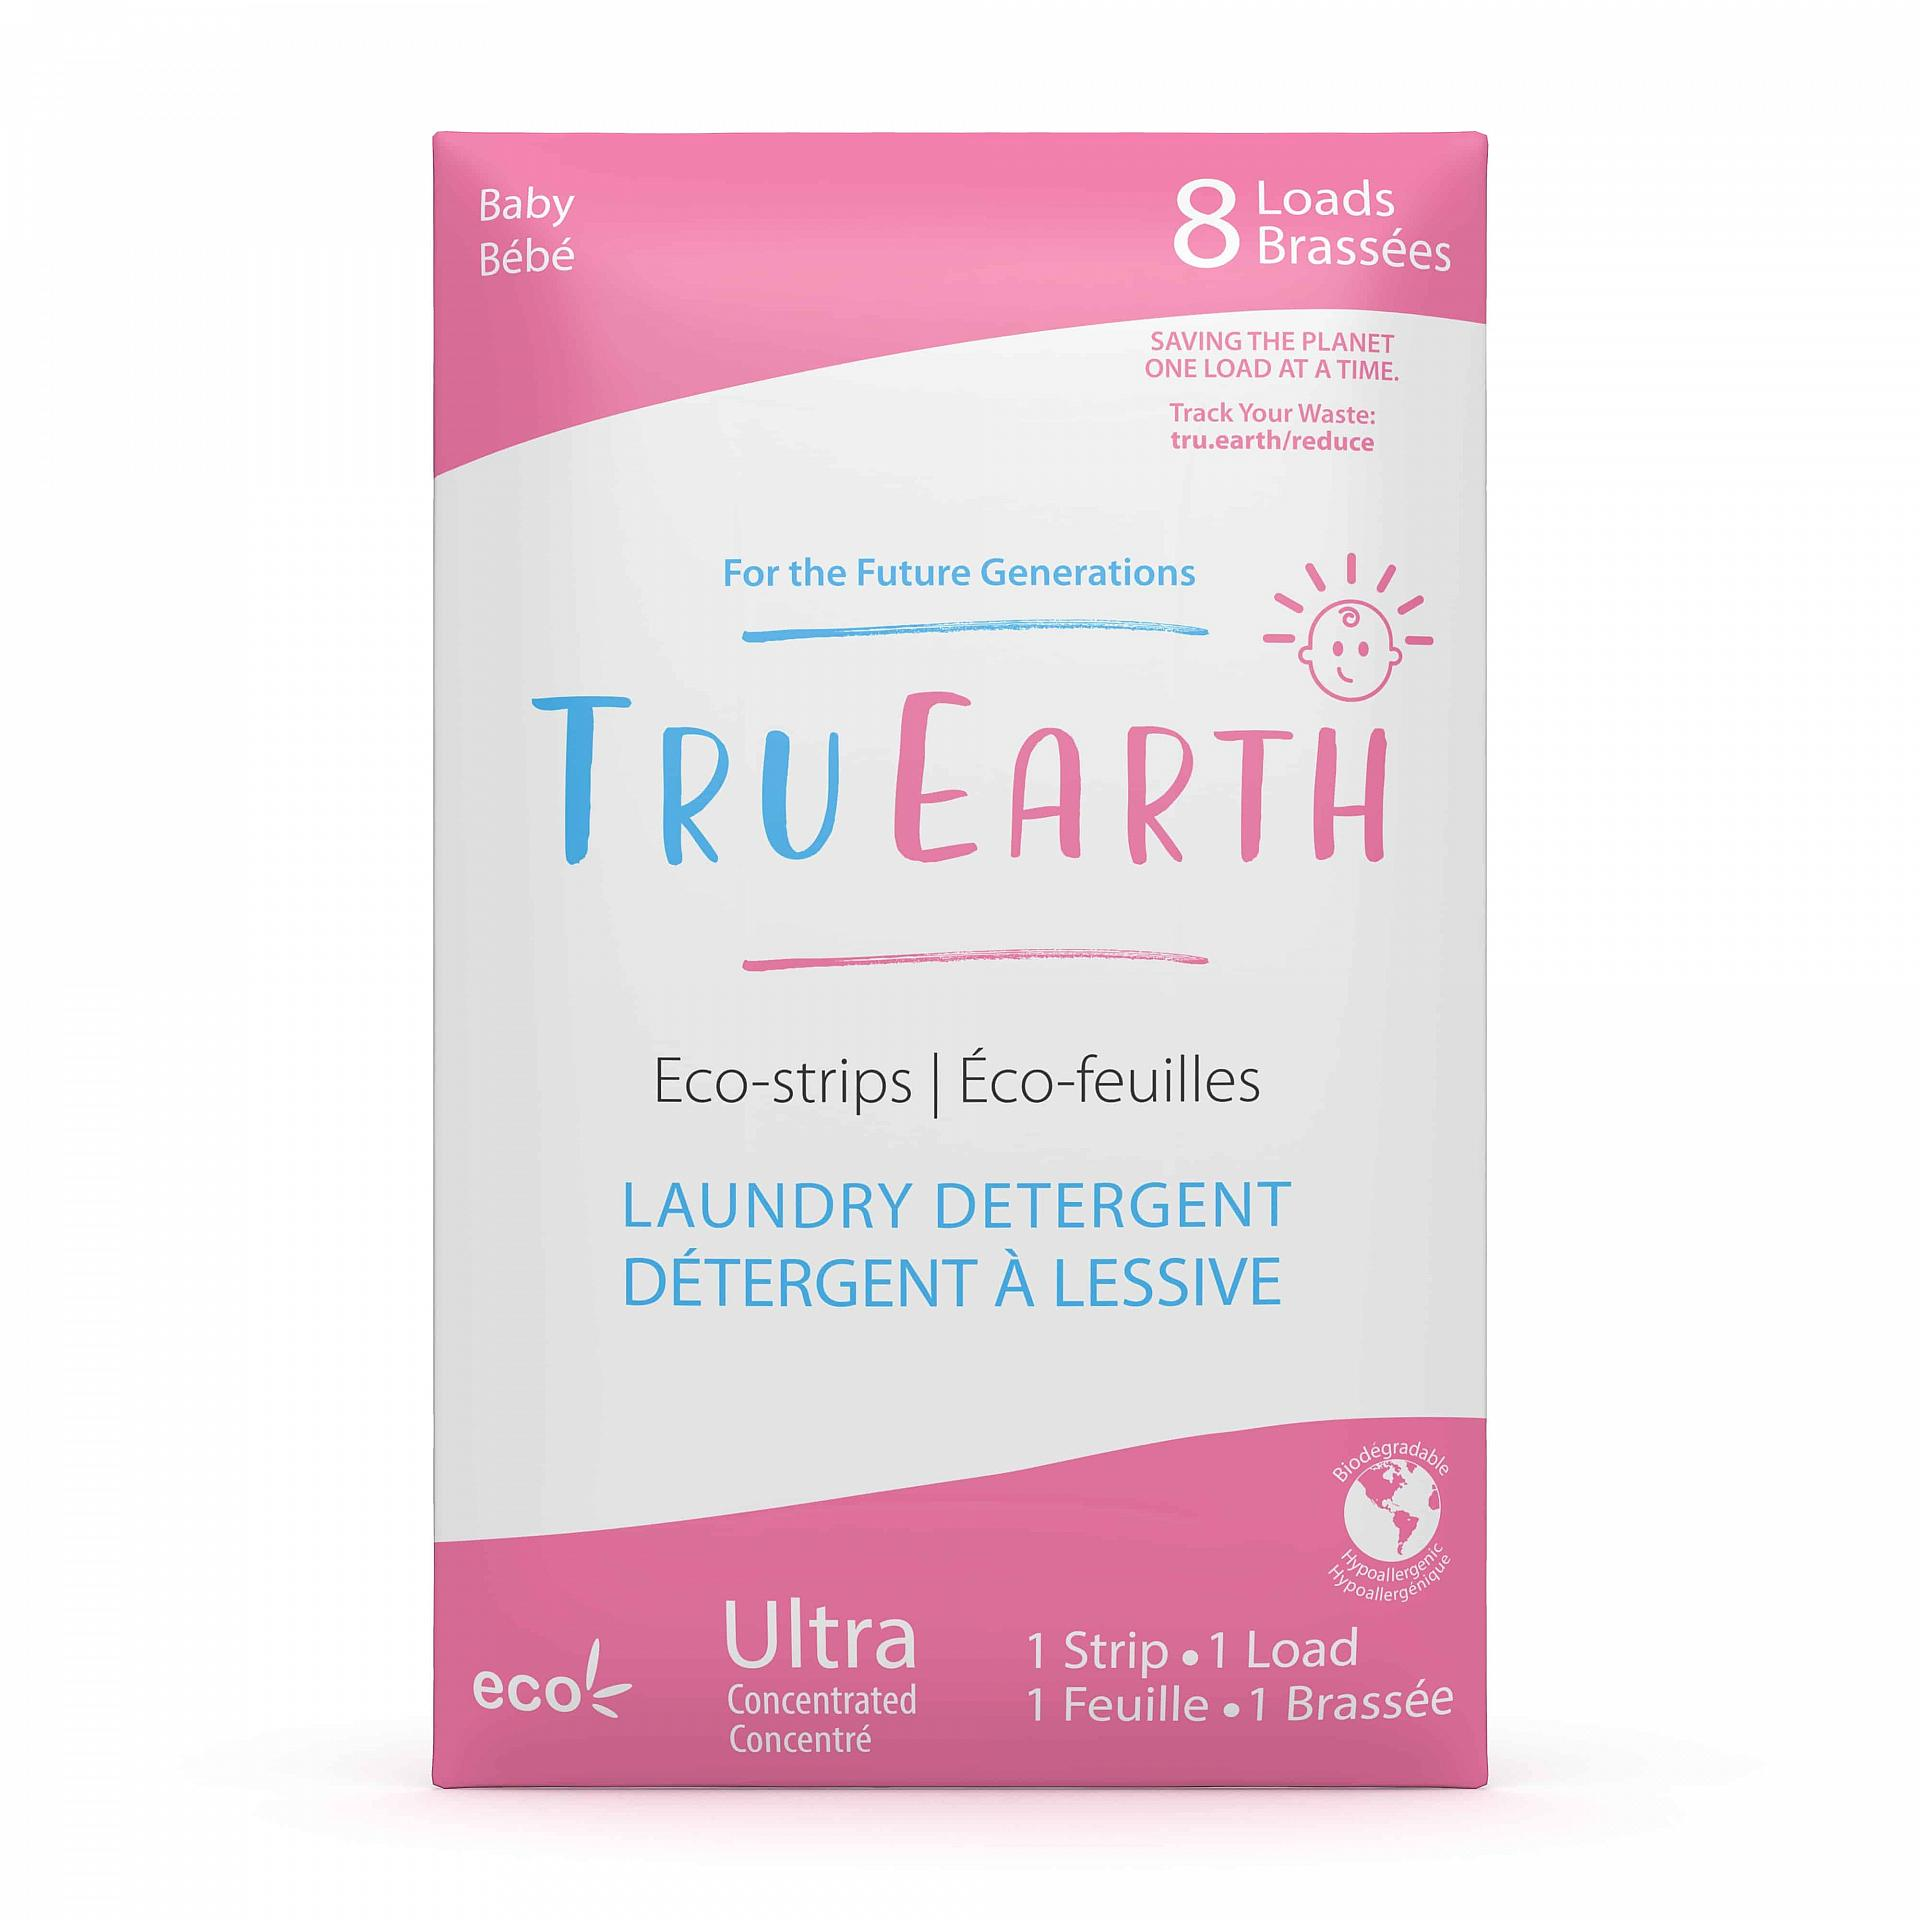 Tru_Earth_Eco_strips_Laundry_Detergent_Baby_8_Loads